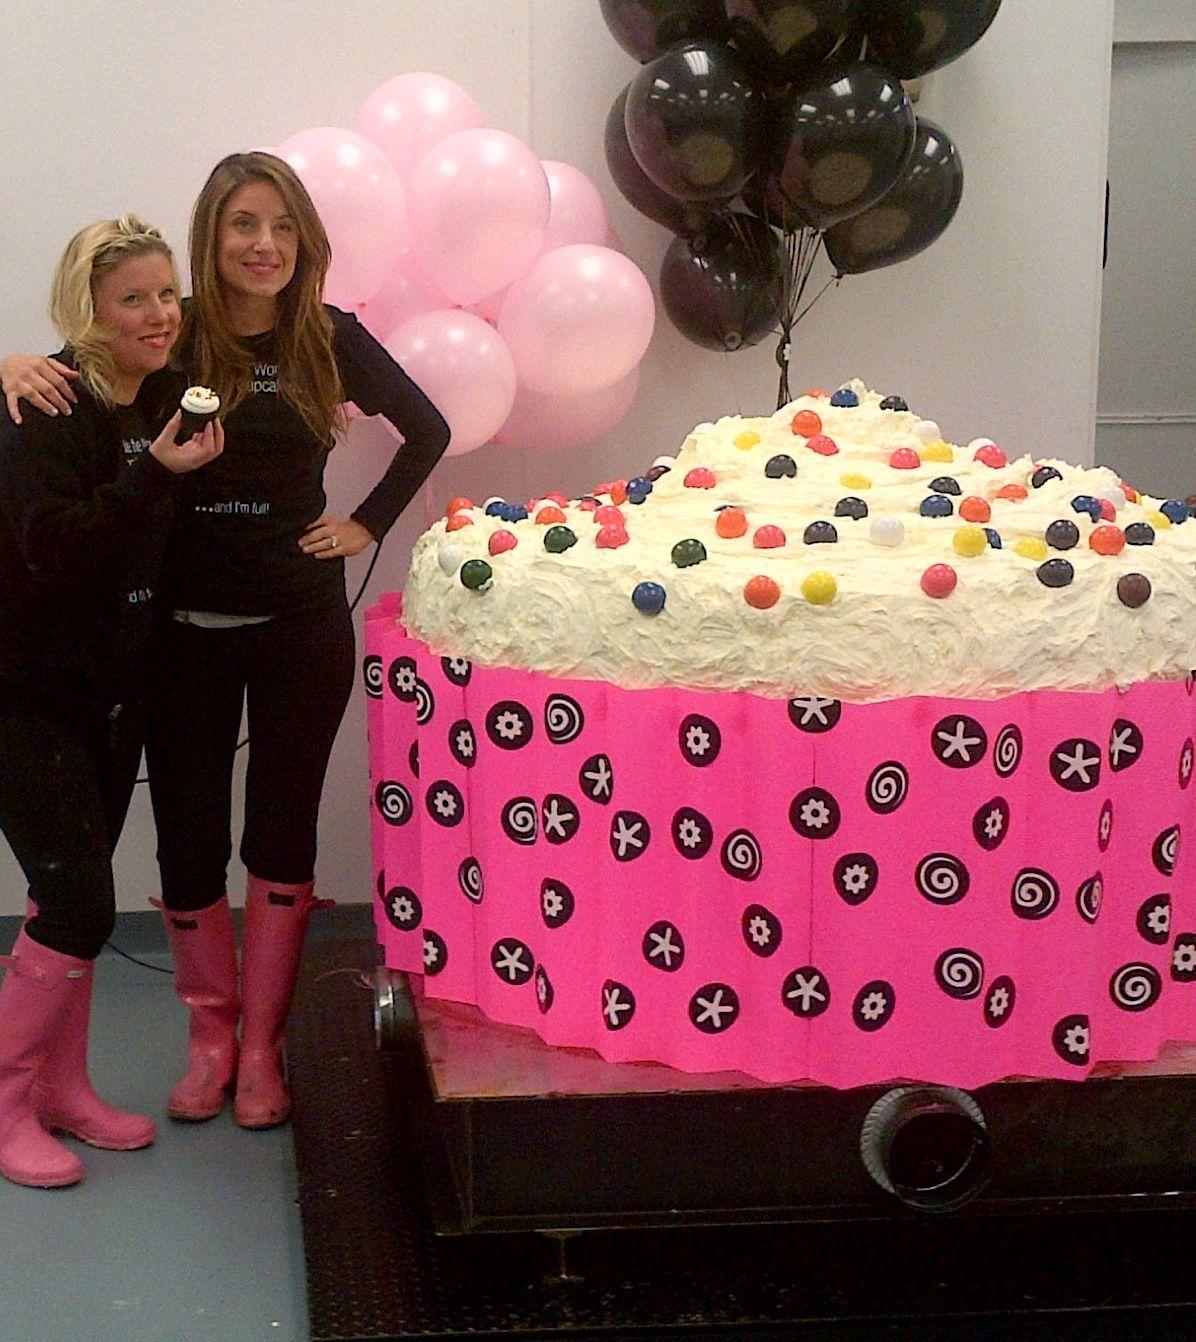 1433795599-georgetown-cupcake-worlds-largest-cupcake